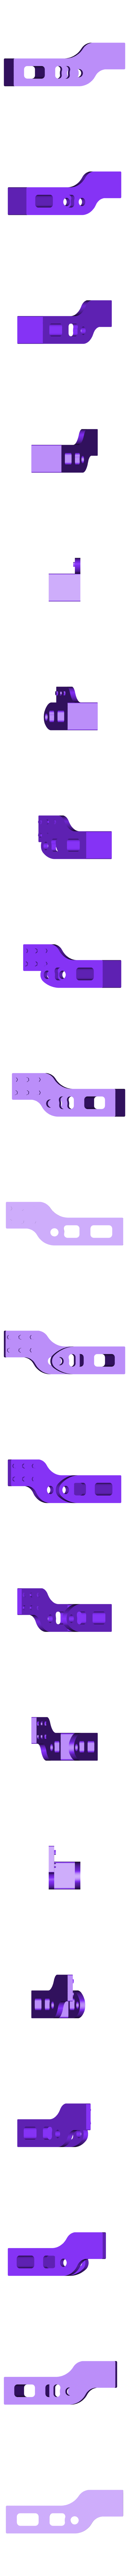 MirrorLink_Support_Frame.STL Download free STL file 4-8-8-4 Big Boy Locomotive • 3D printer object, RaymondDeLuca